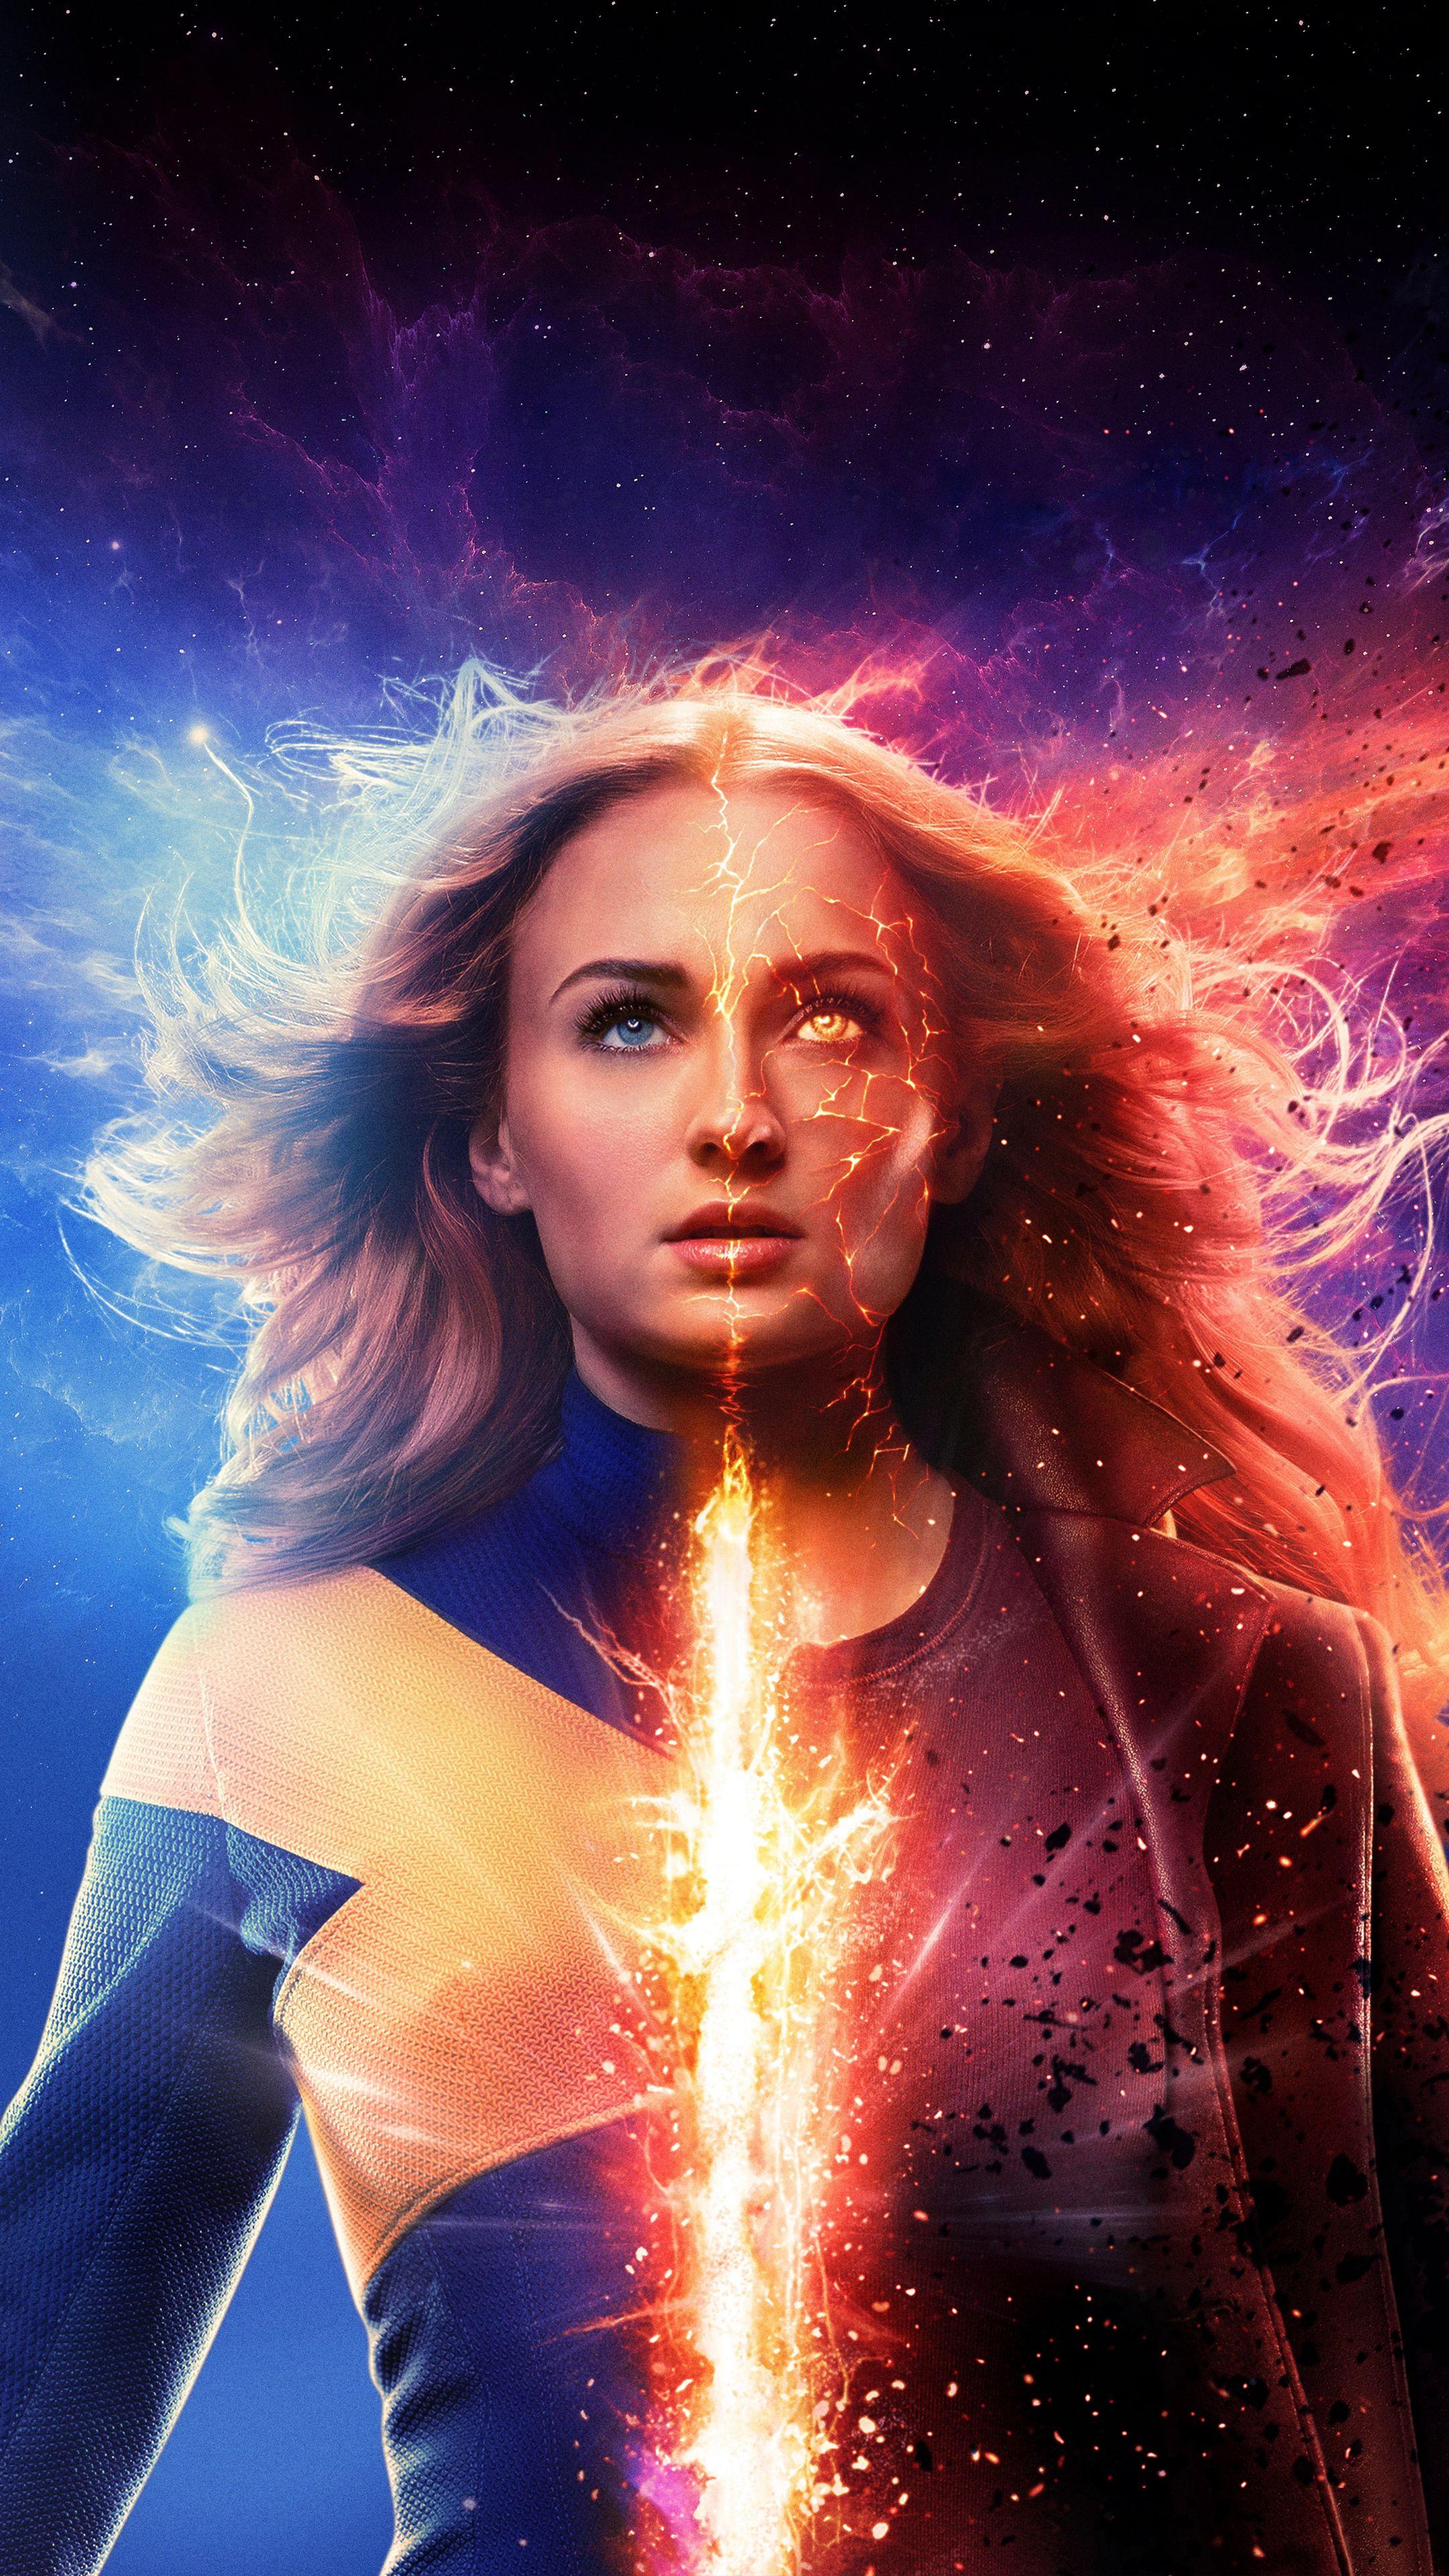 2019 X Men Dark Phoenix 4k In 2160x3840 Resolution Dark Phoenix Phoenix Marvel Phoenix Wallpaper